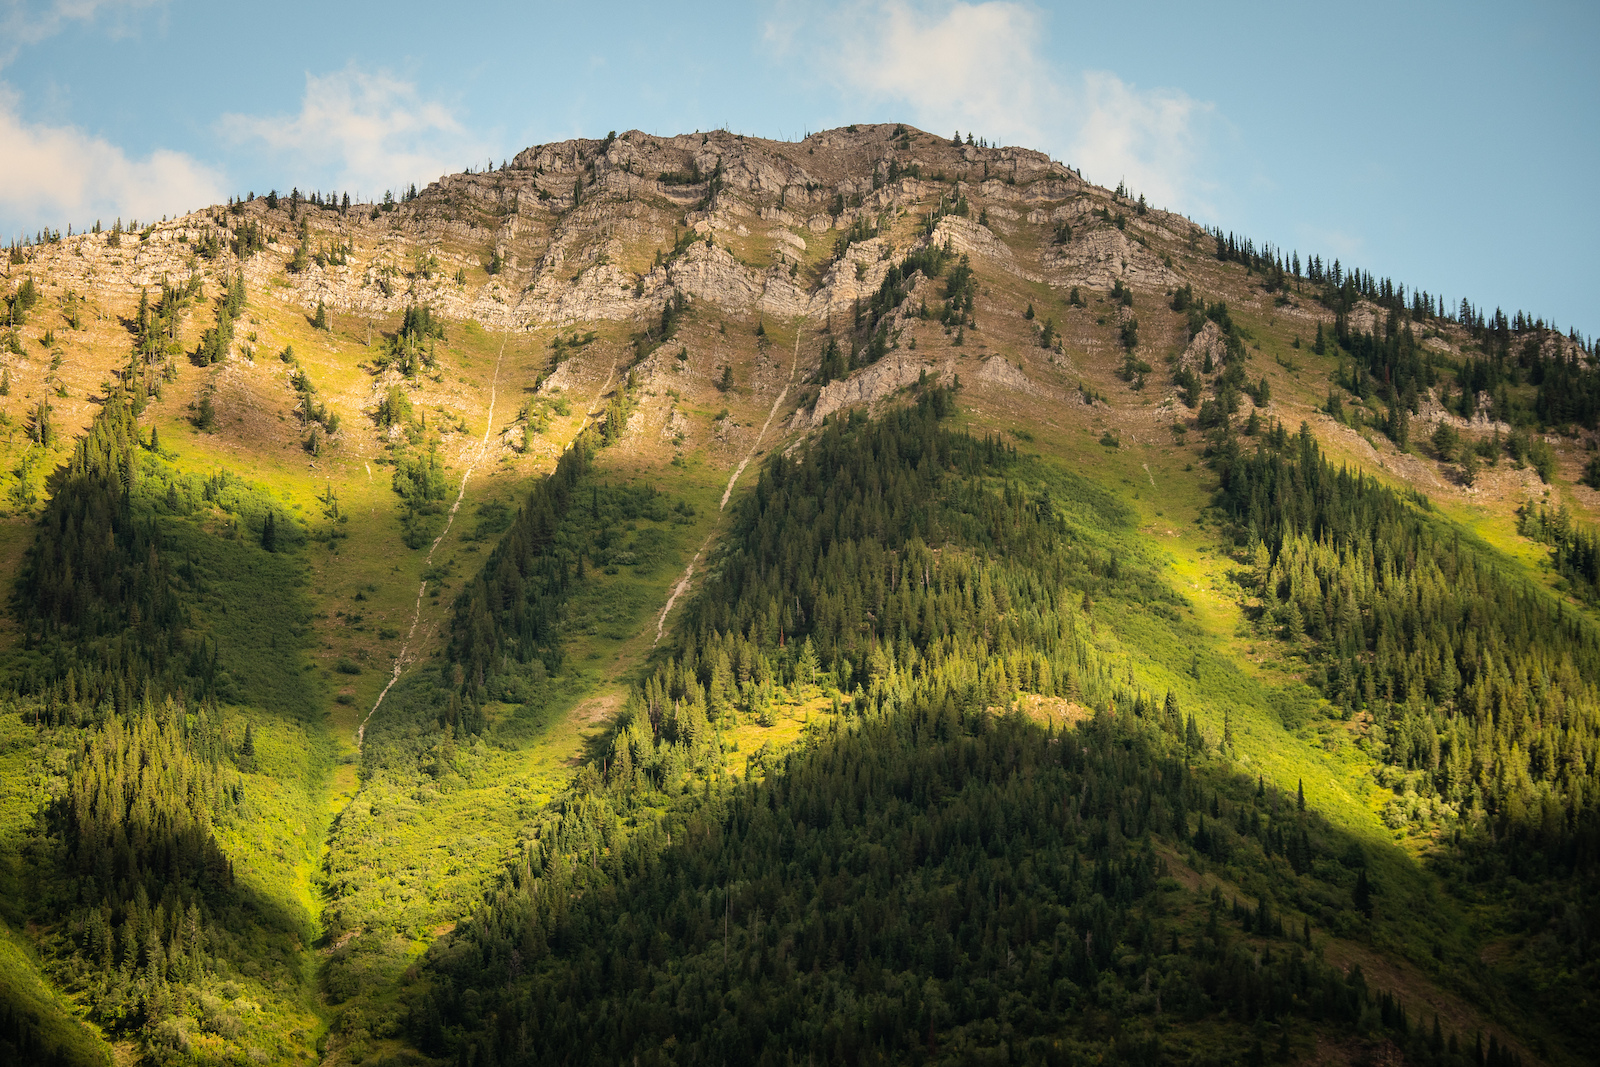 Mount Fernie in all its glory